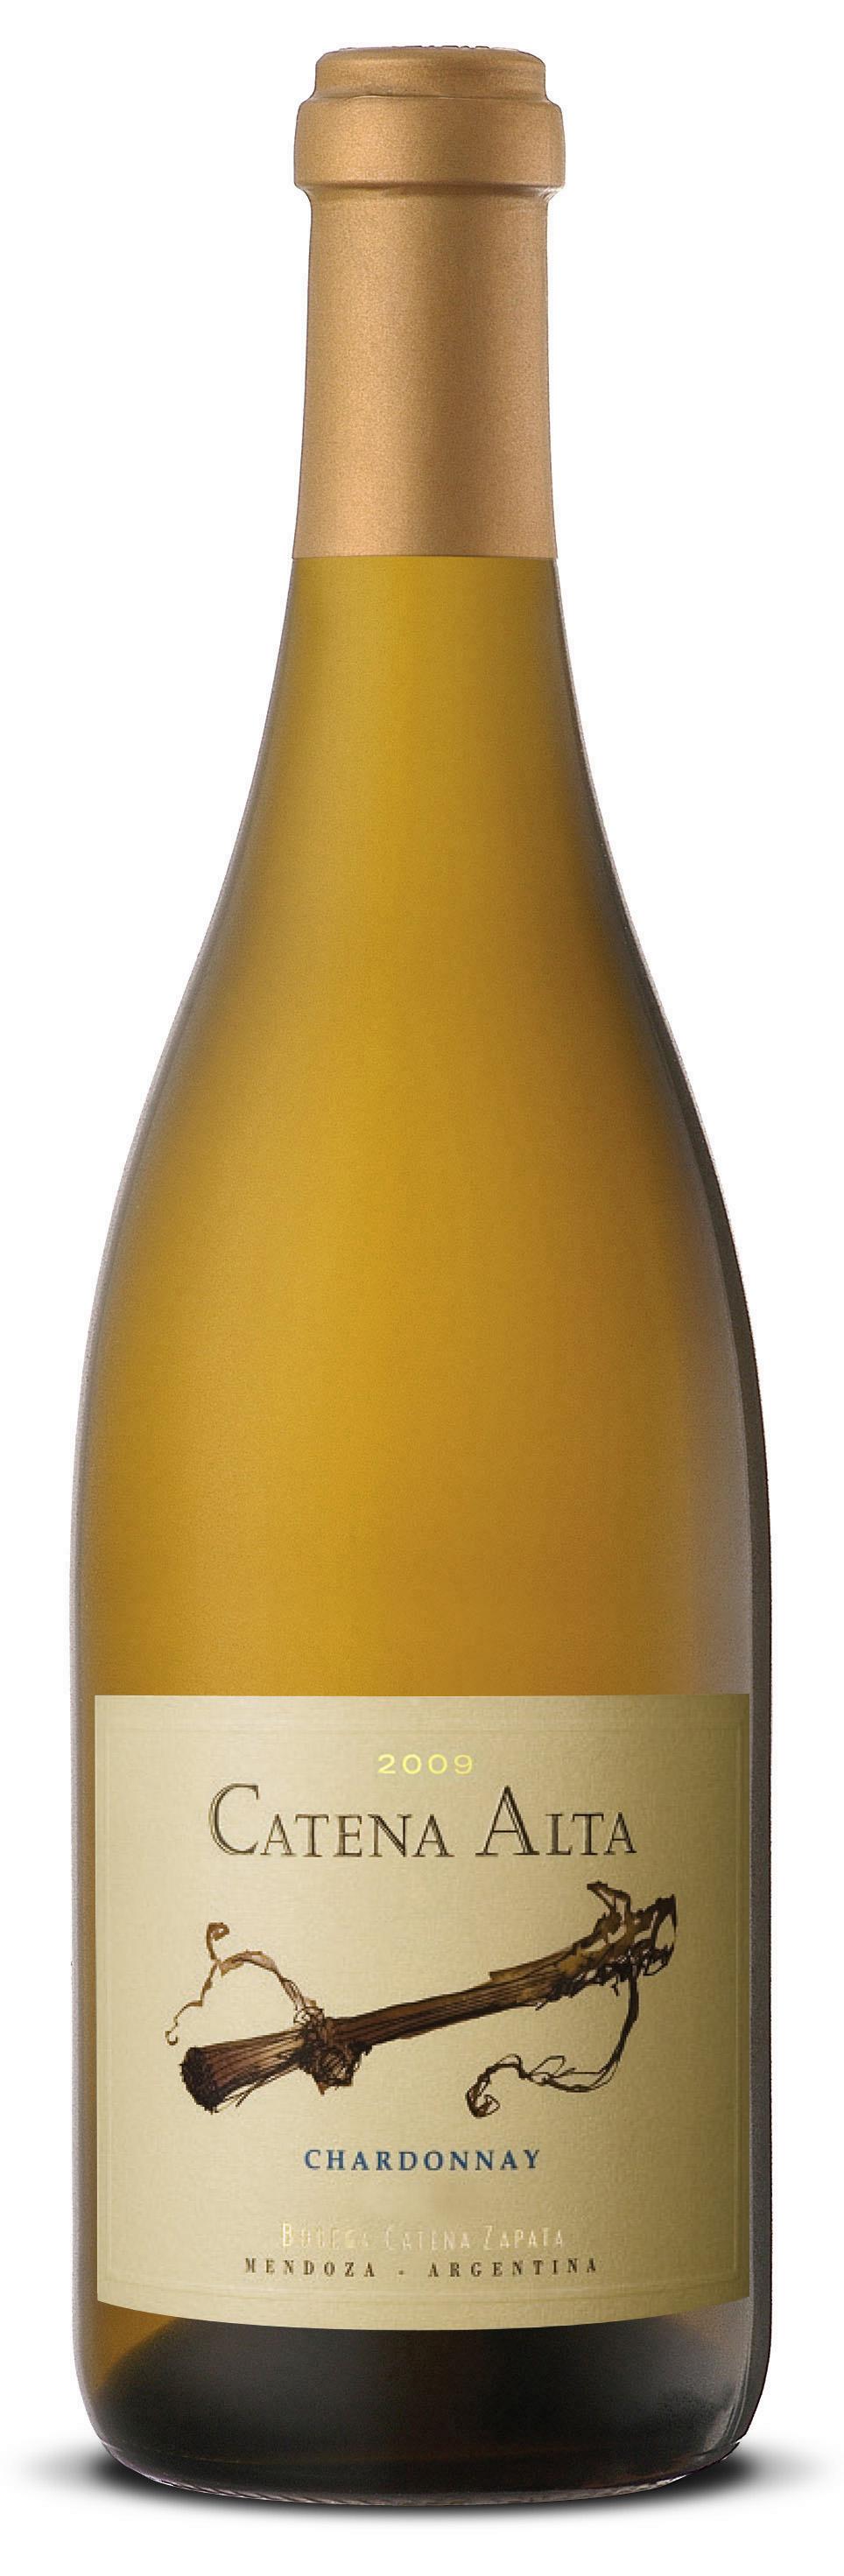 Catena Alta Chardonnay 2009